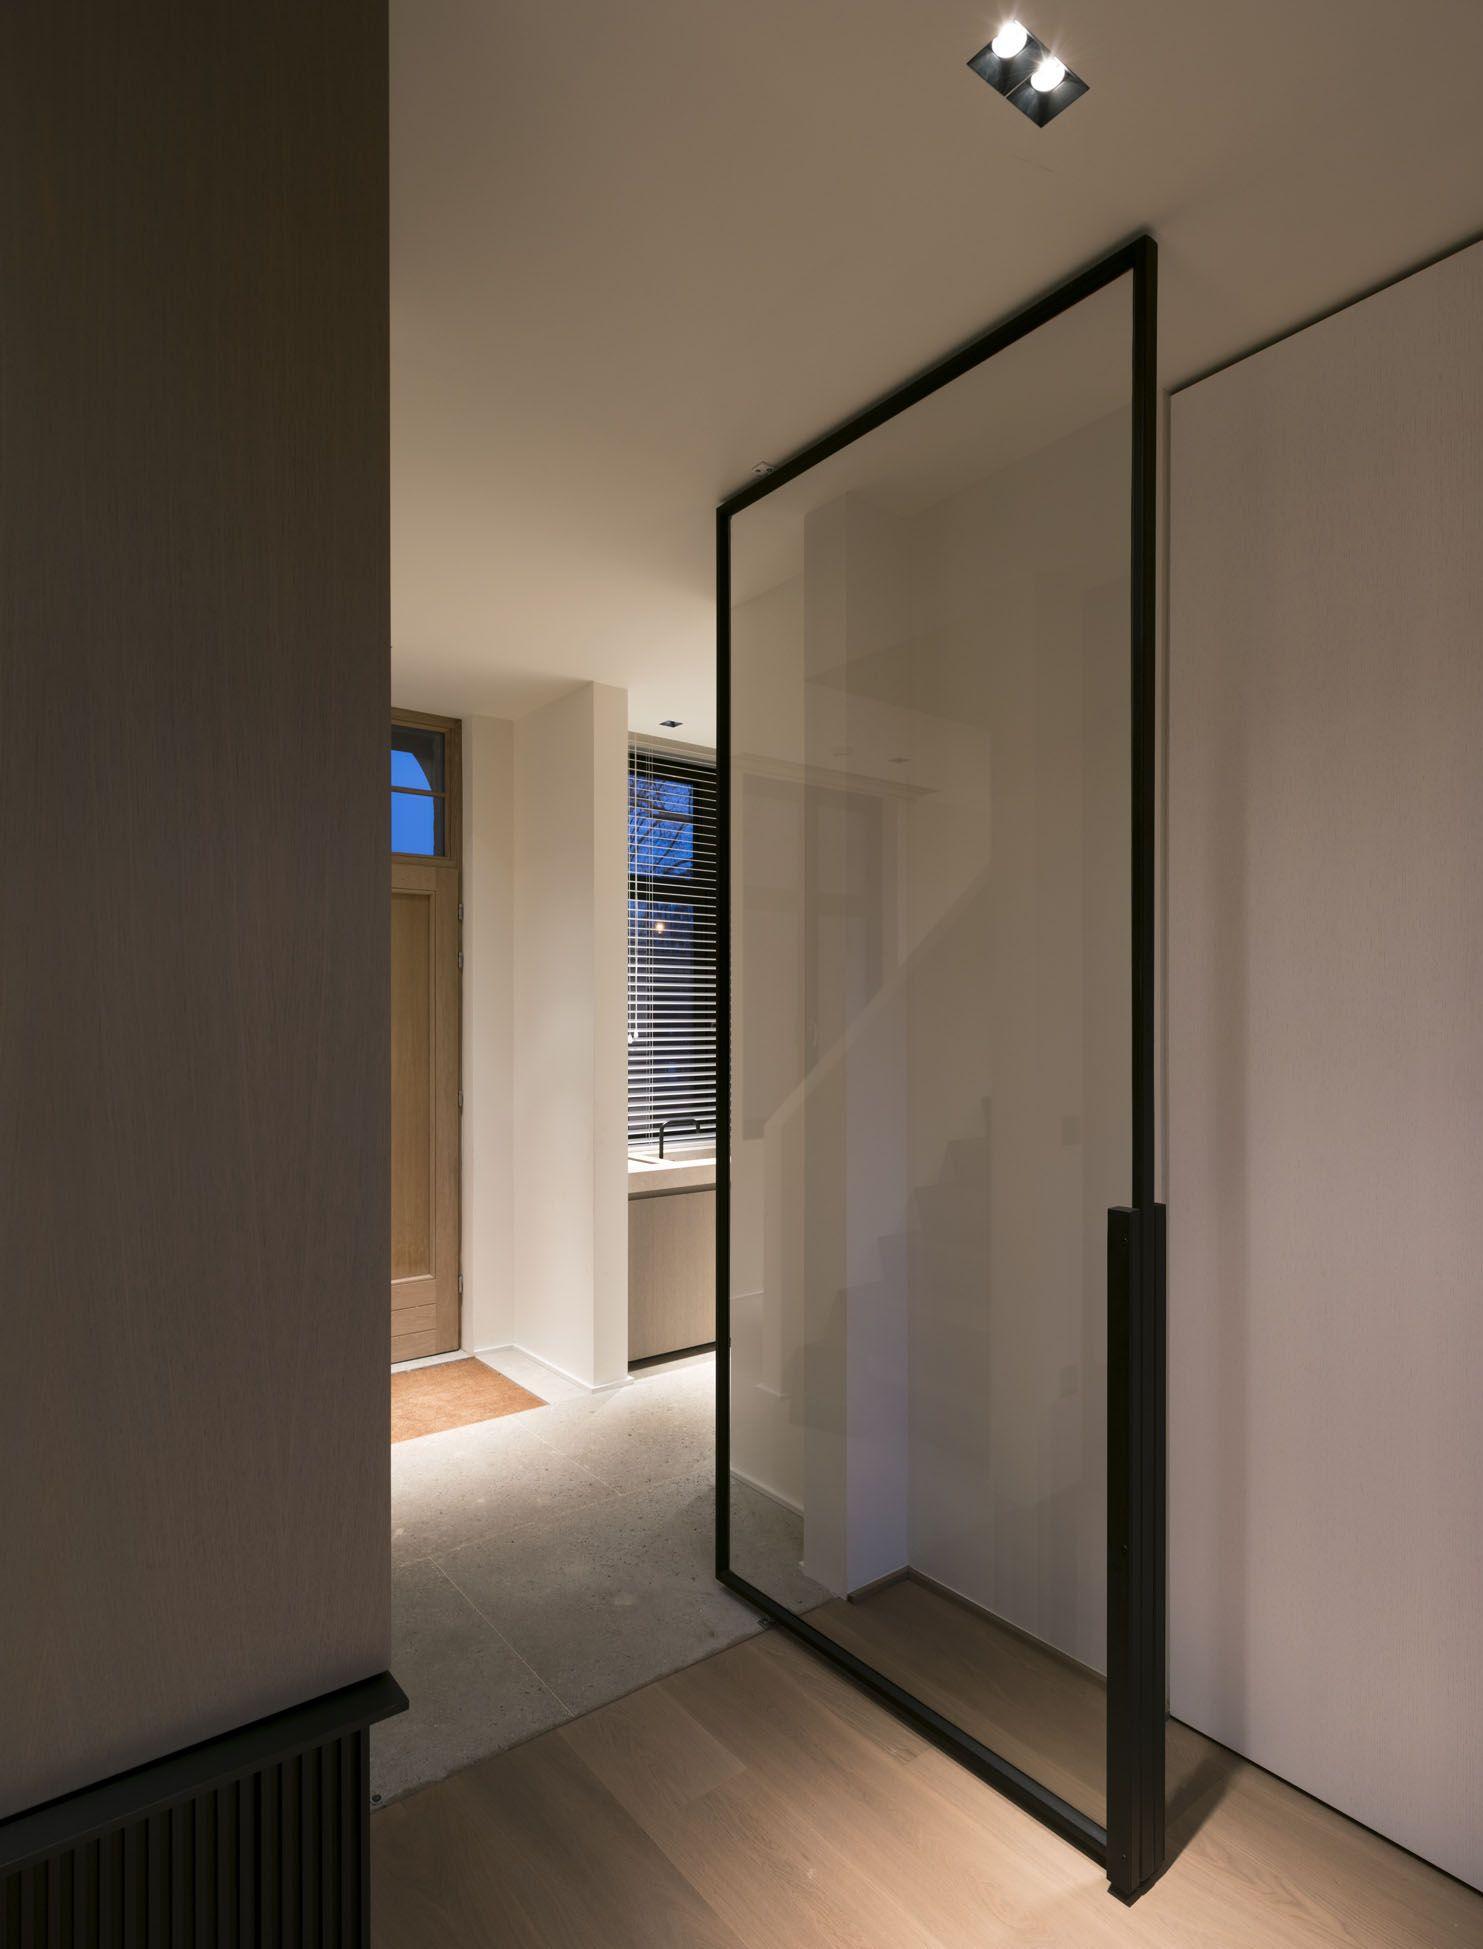 Kreon Lighting Minimalist Modern Led Design Architecture Glass Door Steel Black Recessed Spotlight Downlight Hal Door Design Steel Door Design Led Light Design